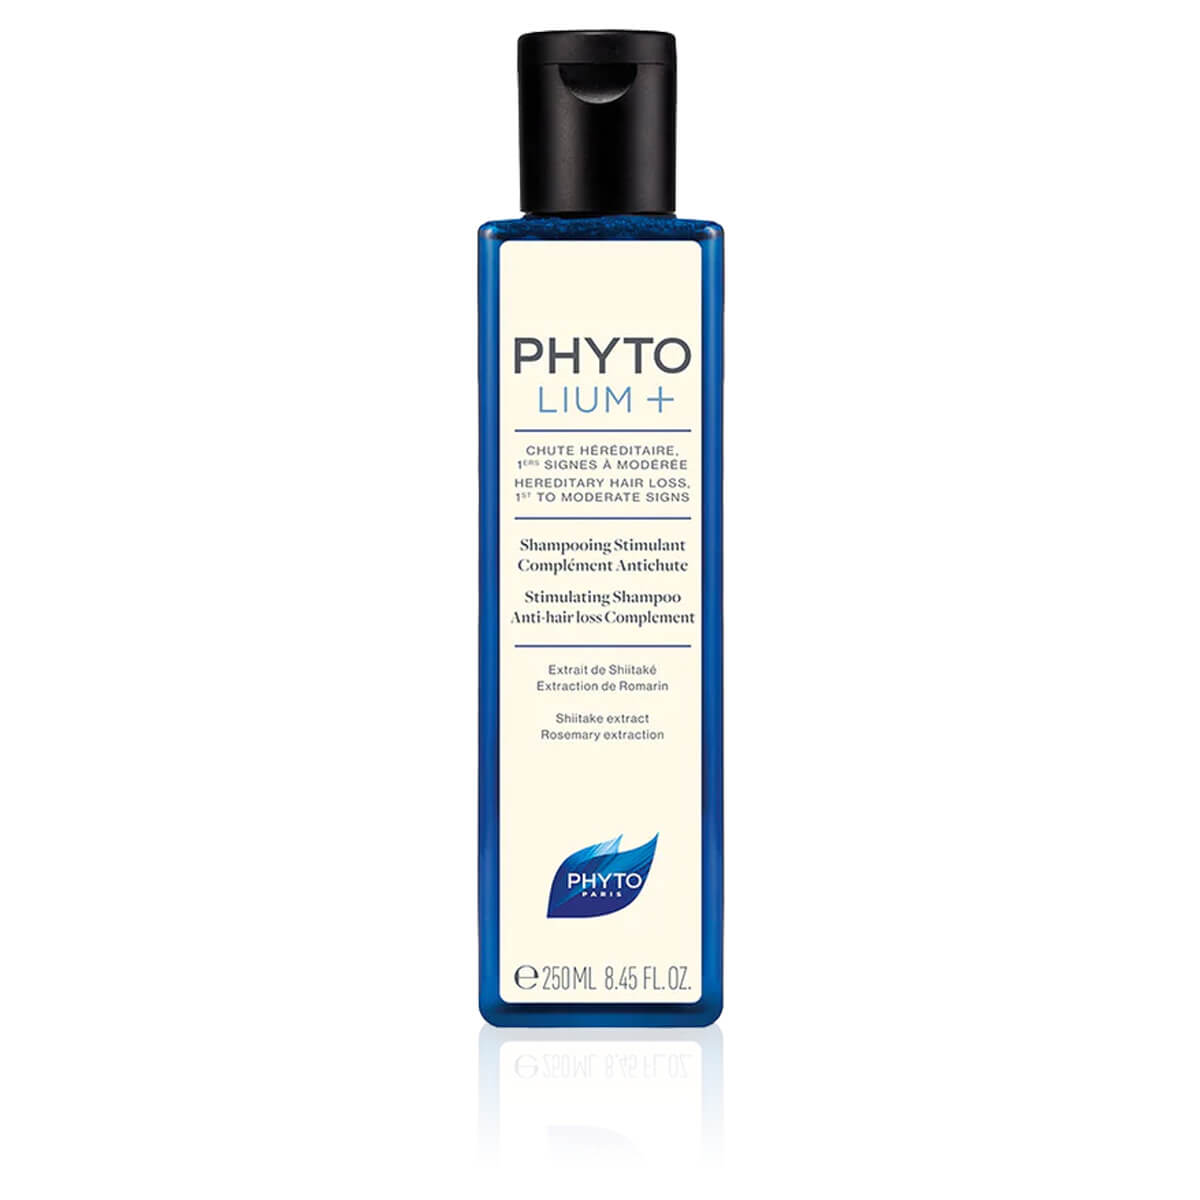 PhytoLium + Shampoo Stimolante Complemento Anticaduta